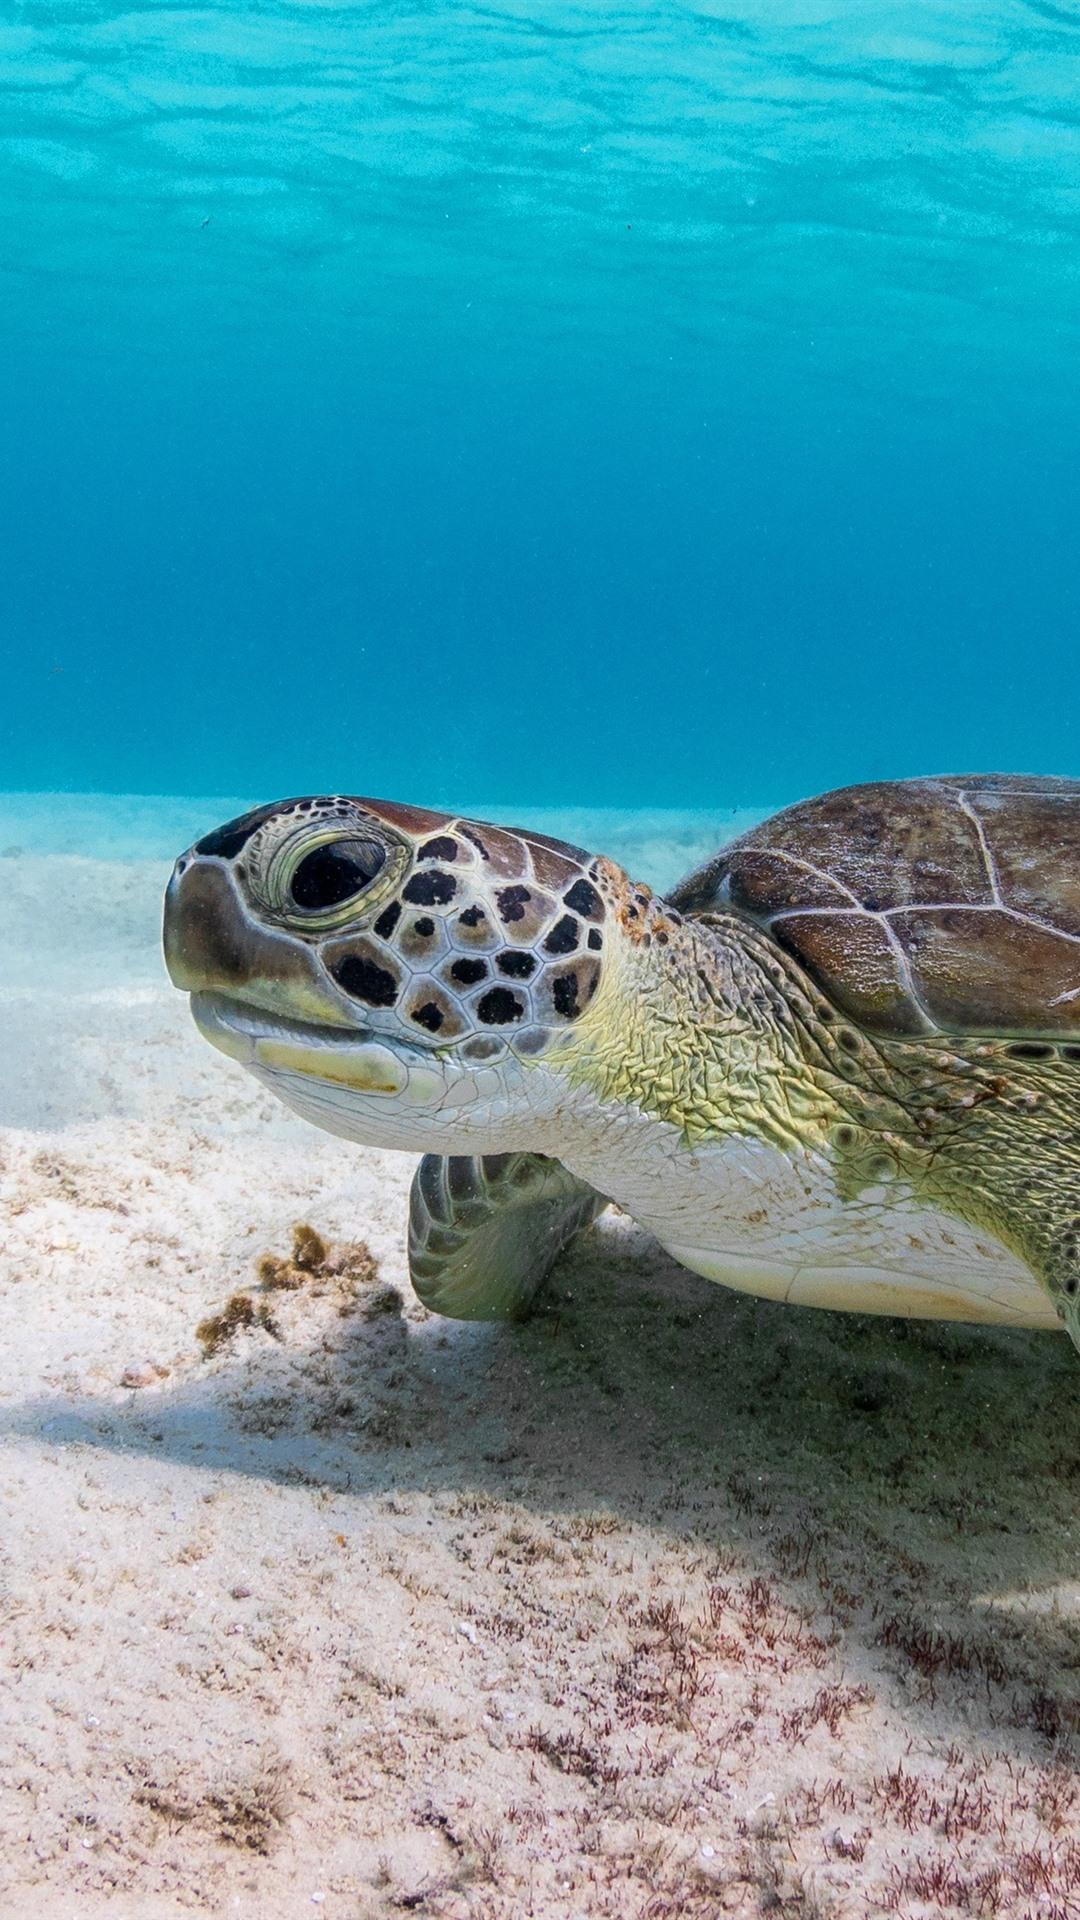 Wallpaper Turtle Underwater Sea 3840x2160 Uhd 4k Picture Image